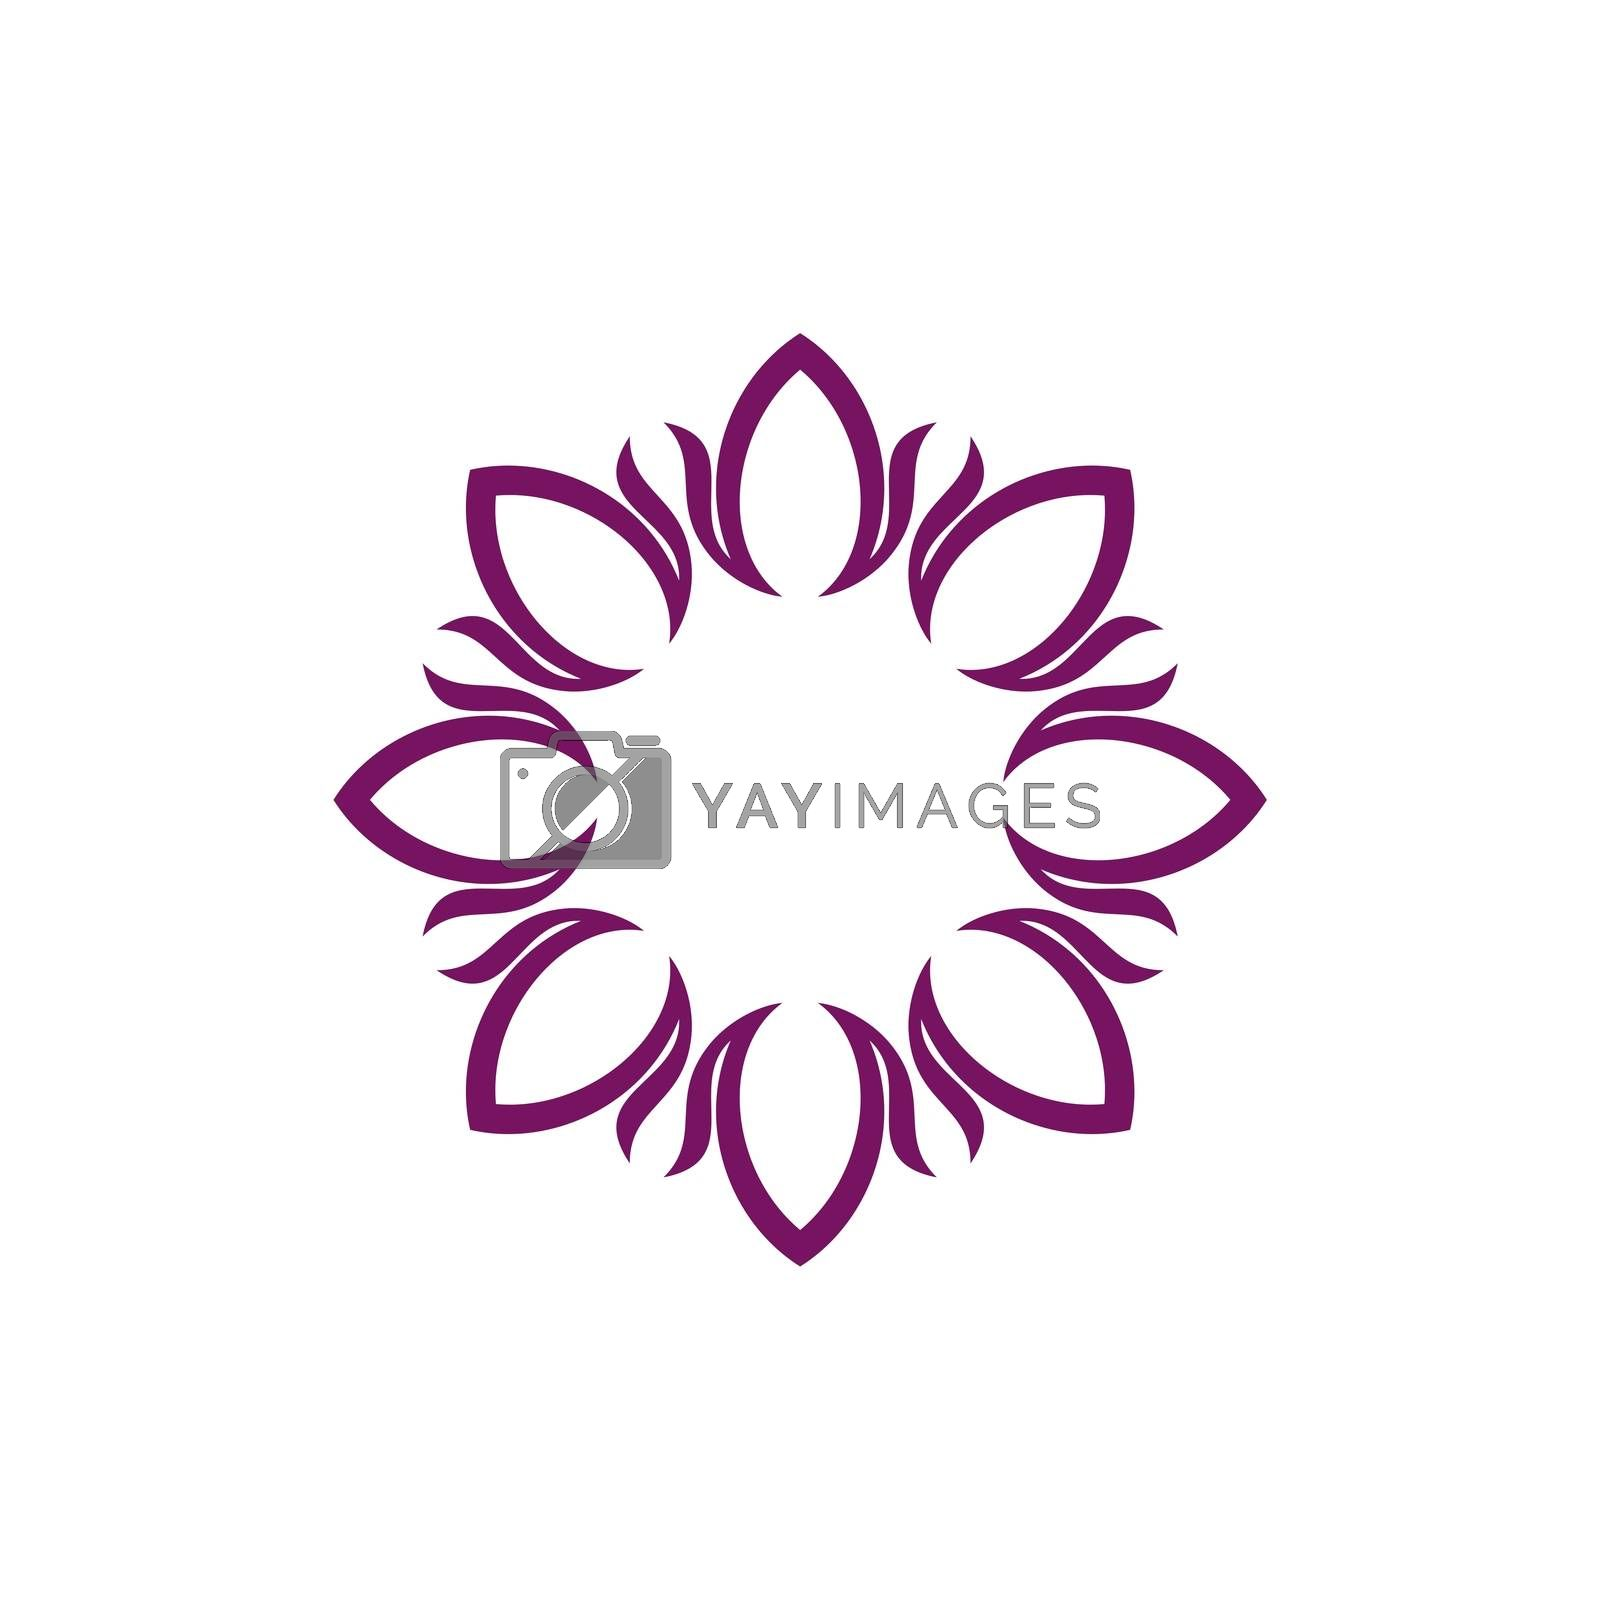 Abstract Purple Circle Flower Logo Template Illustration Design. Vector EPS 10.